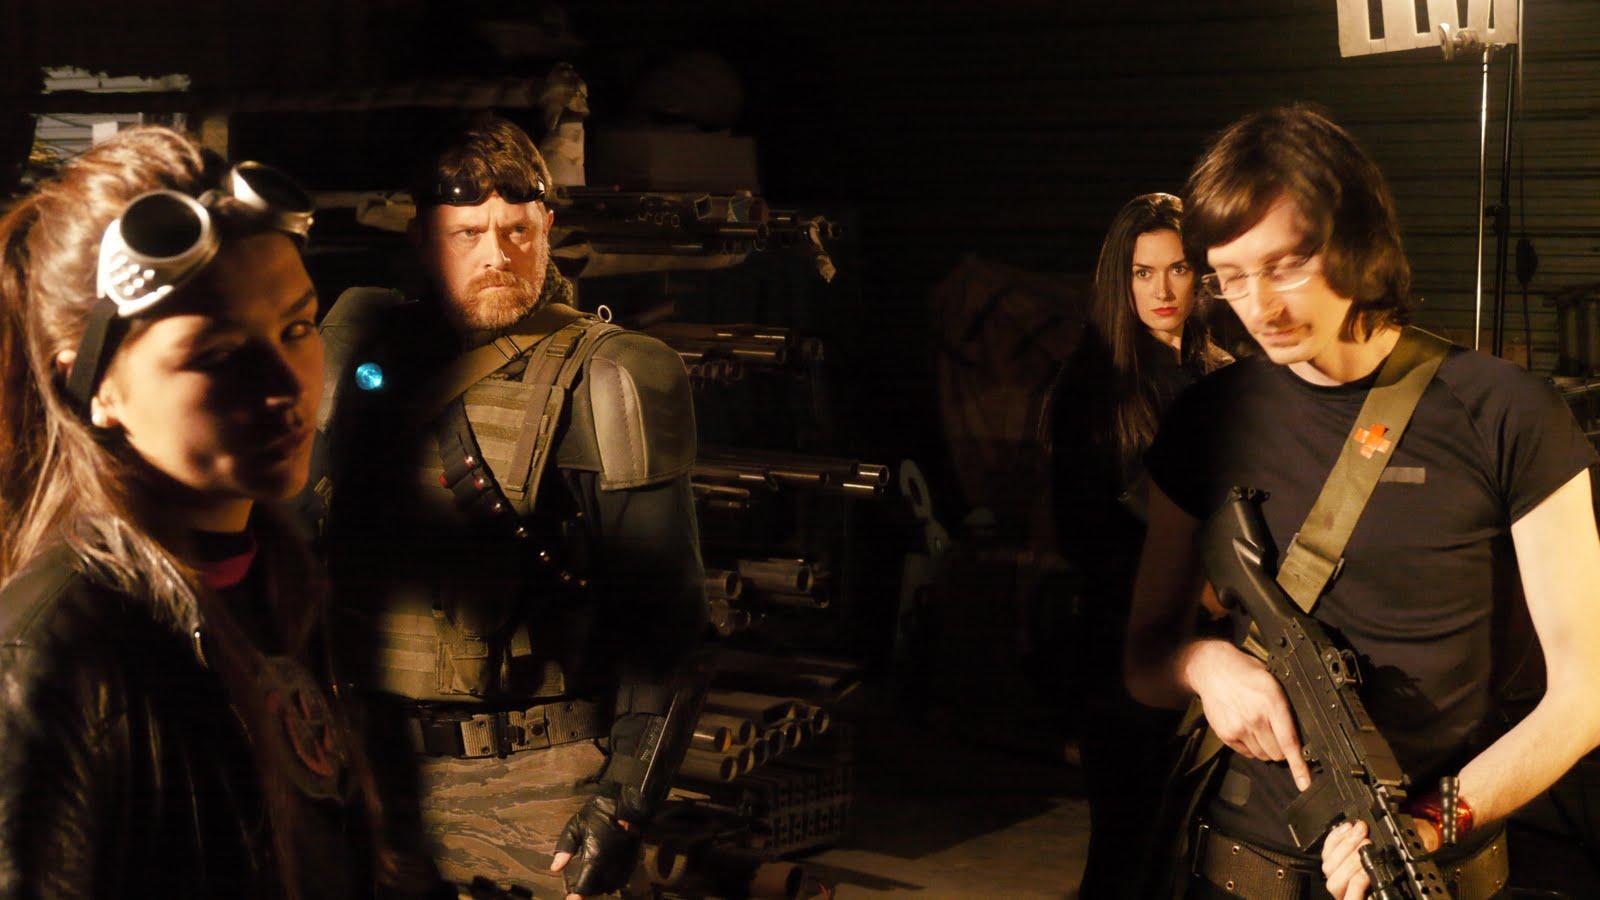 The mercenaries prepare to enter the facility - (l to r) Juanita Arias, Joe Chapman, Virginia Logan and Nat Cassidy in Android Insurrection (2012)